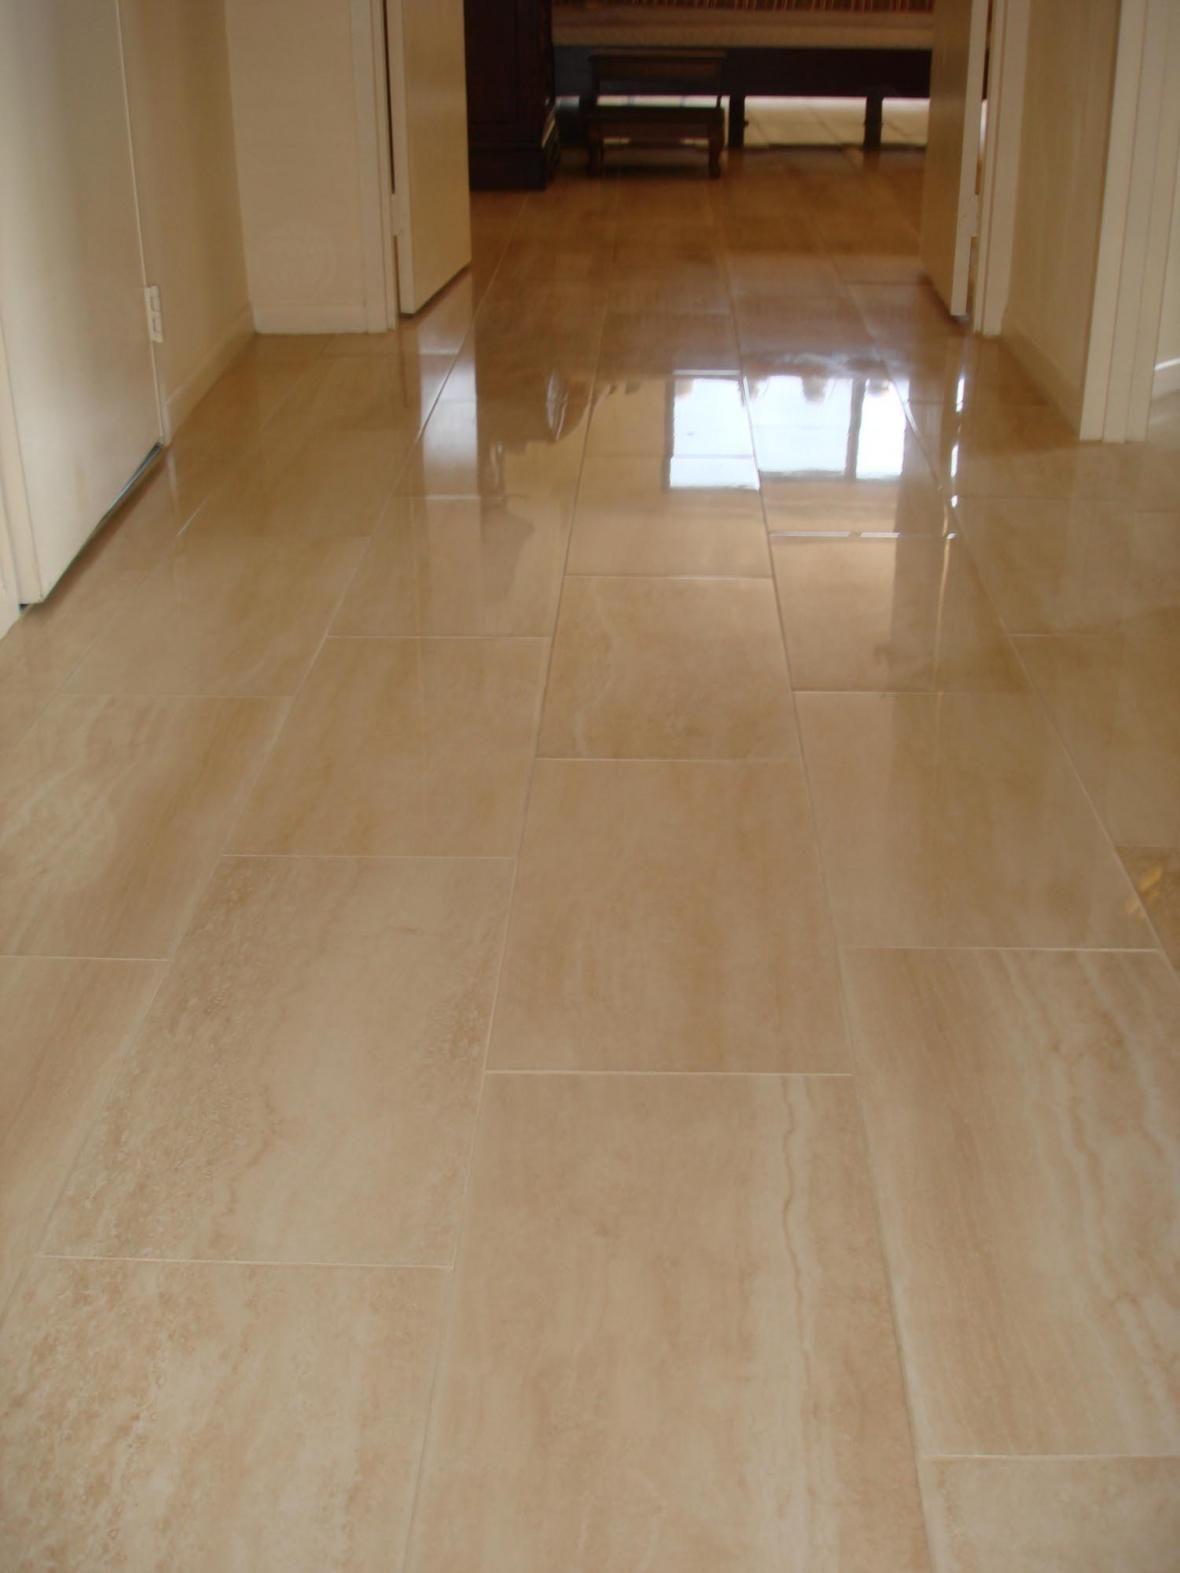 porcelain flooring | Porcelain tile floor in hallway ...